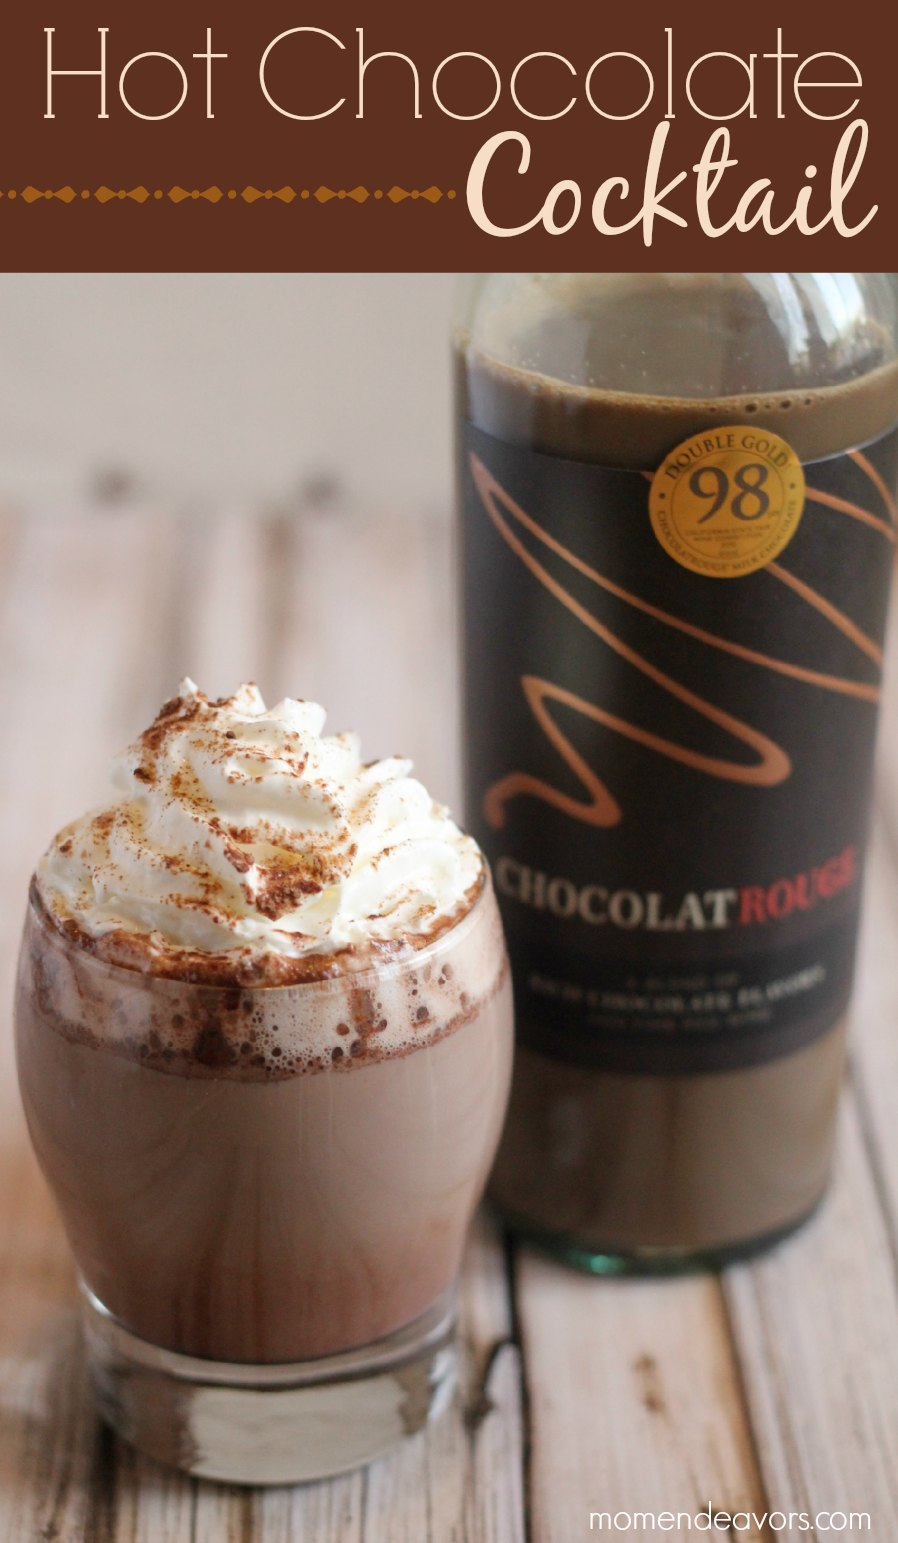 Hot-Chocolate-Cocktail.jpg